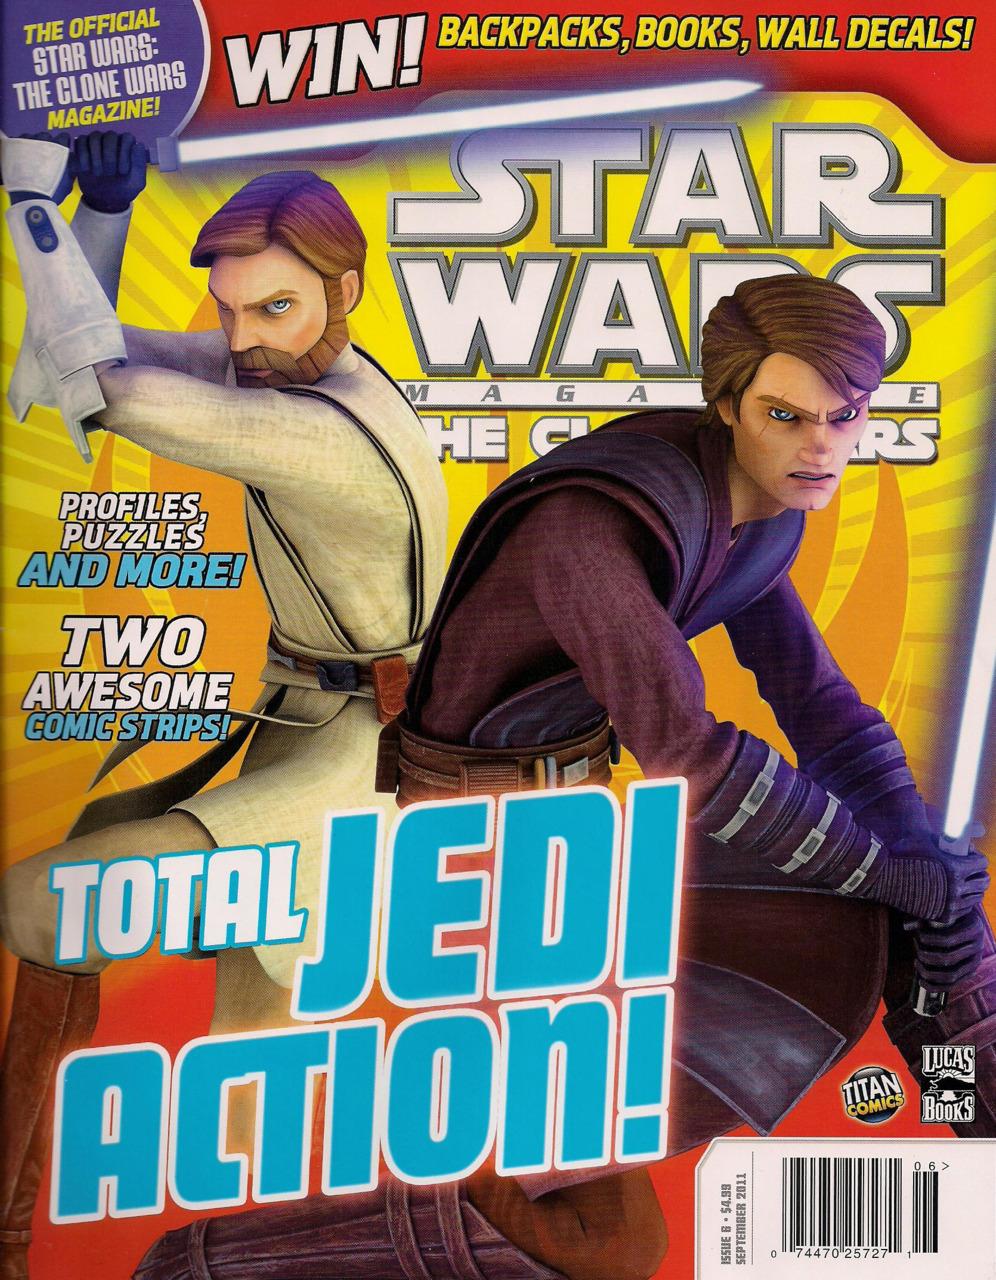 Star Wars The Clone Wars Magazine 6